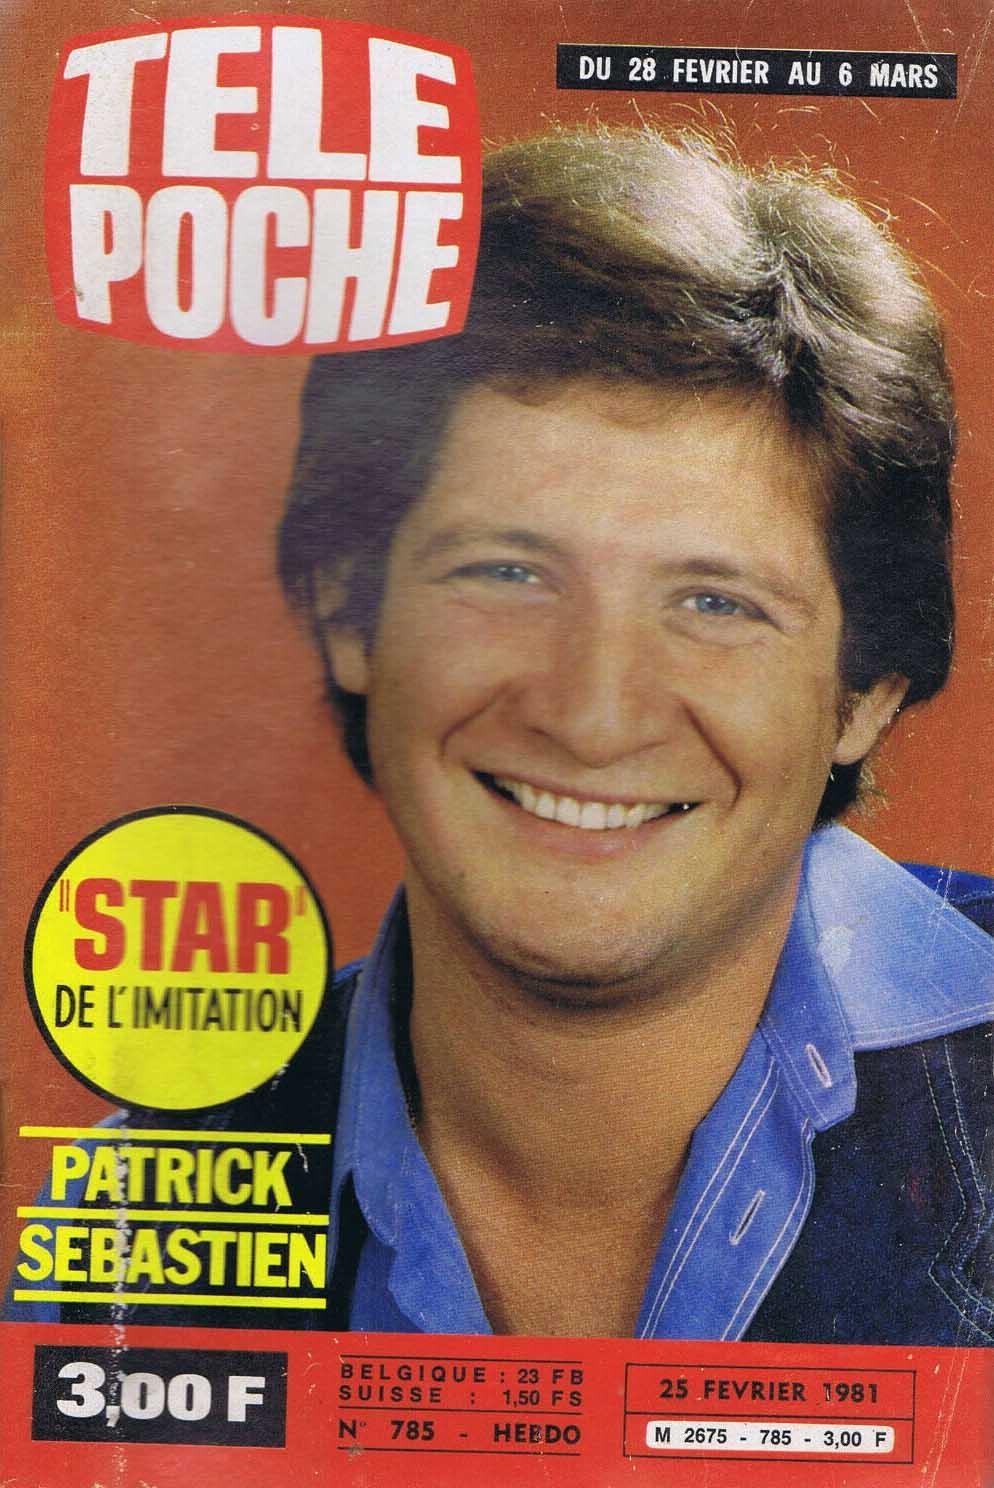 28 février au 6 mars 1981